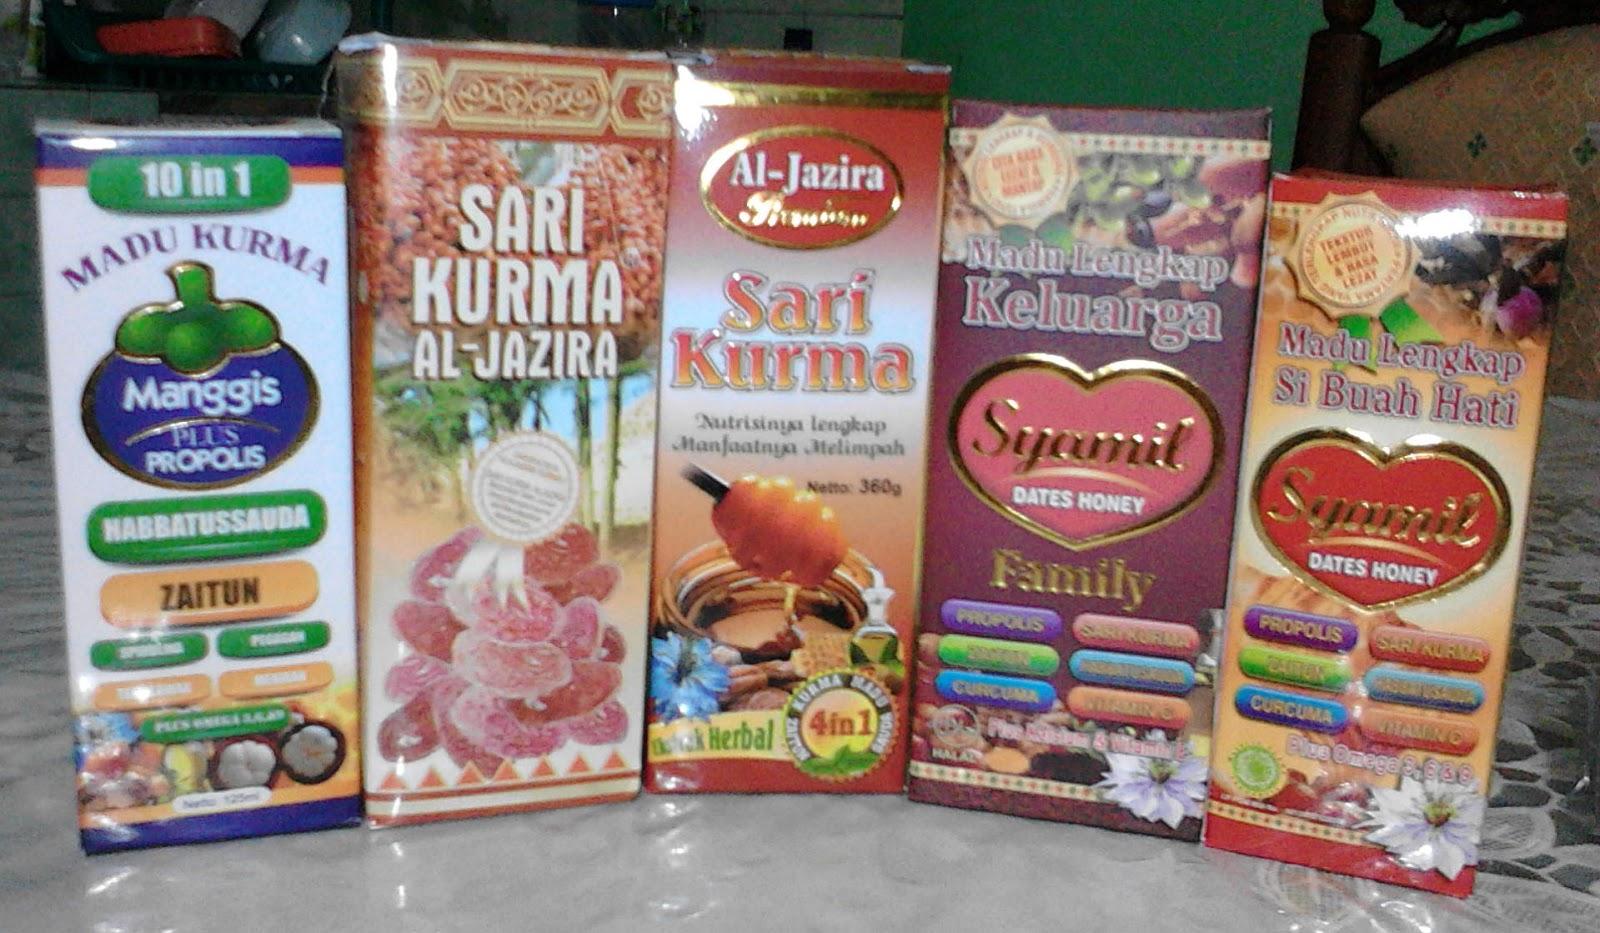 Jamkho Penurun Kolesterol Produk Lain Sari Kurma Aljazira Madu Murni Assyifau Premium Propolis Manggis Habbatussauda Minyak Zaitun Dan